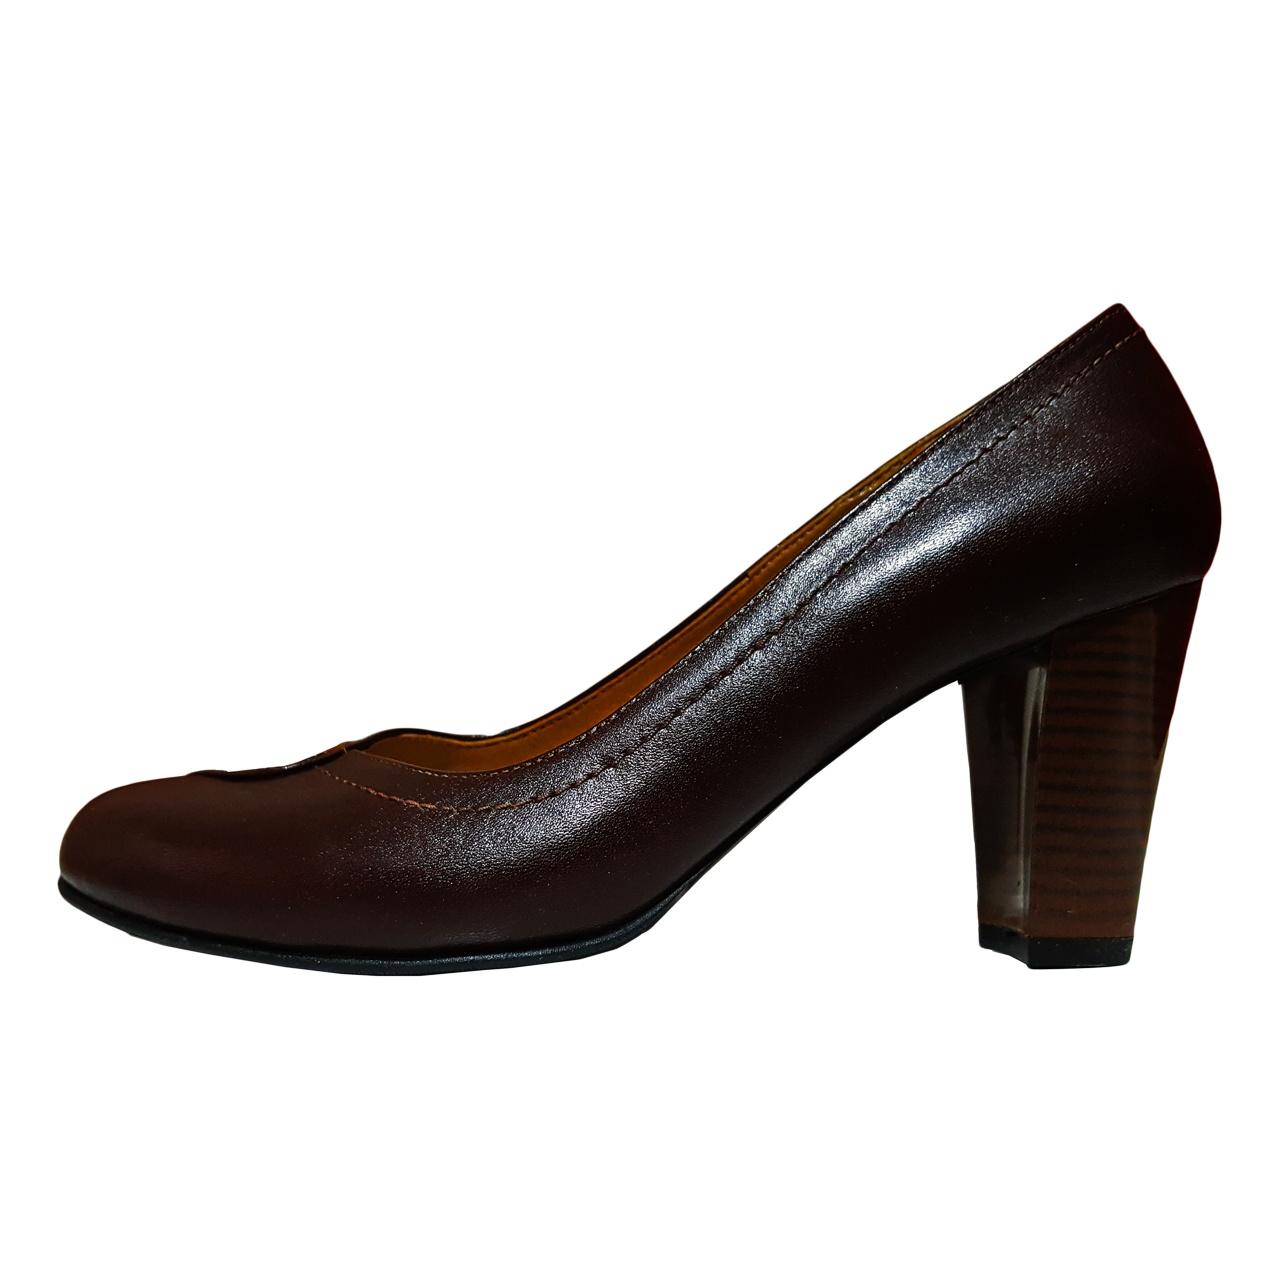 کفش زنانه چرم شهرزاد کد 1101